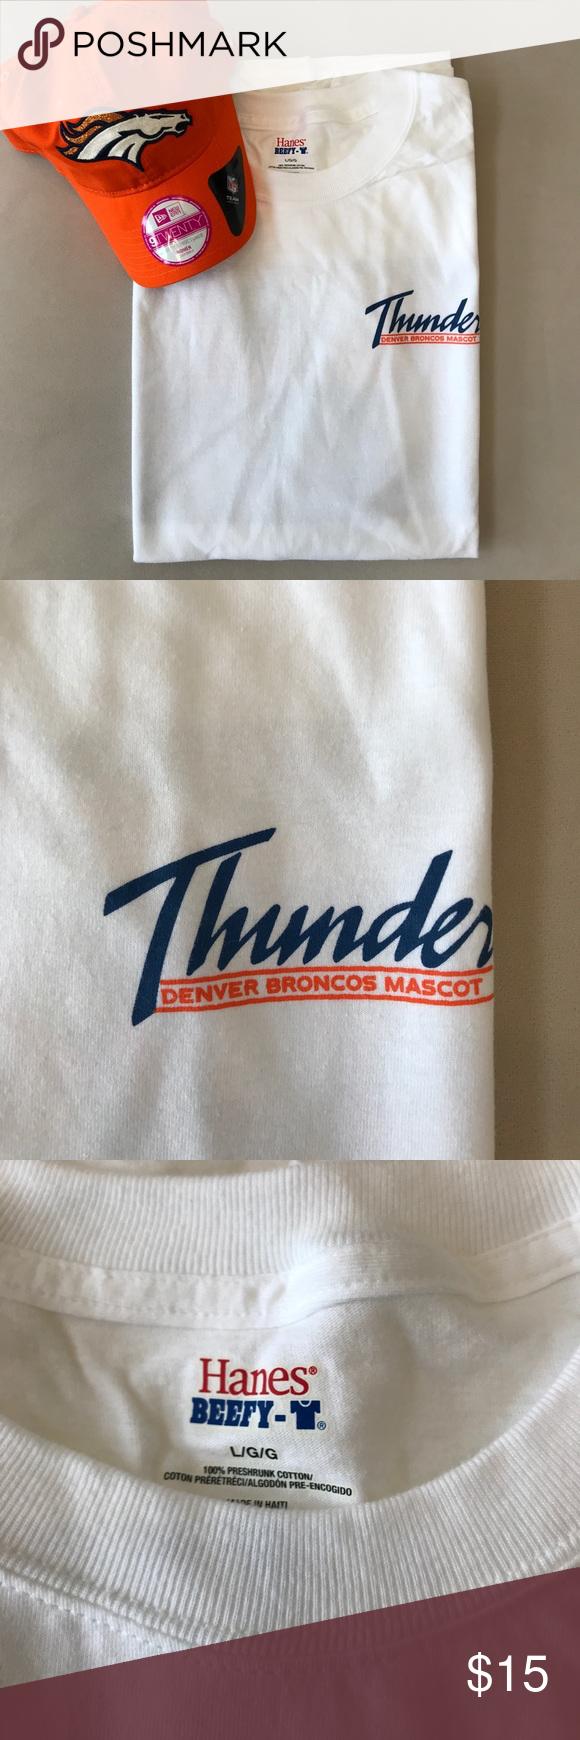 Brand new Denver Broncos Thunder Mascot Tshirt Shirts